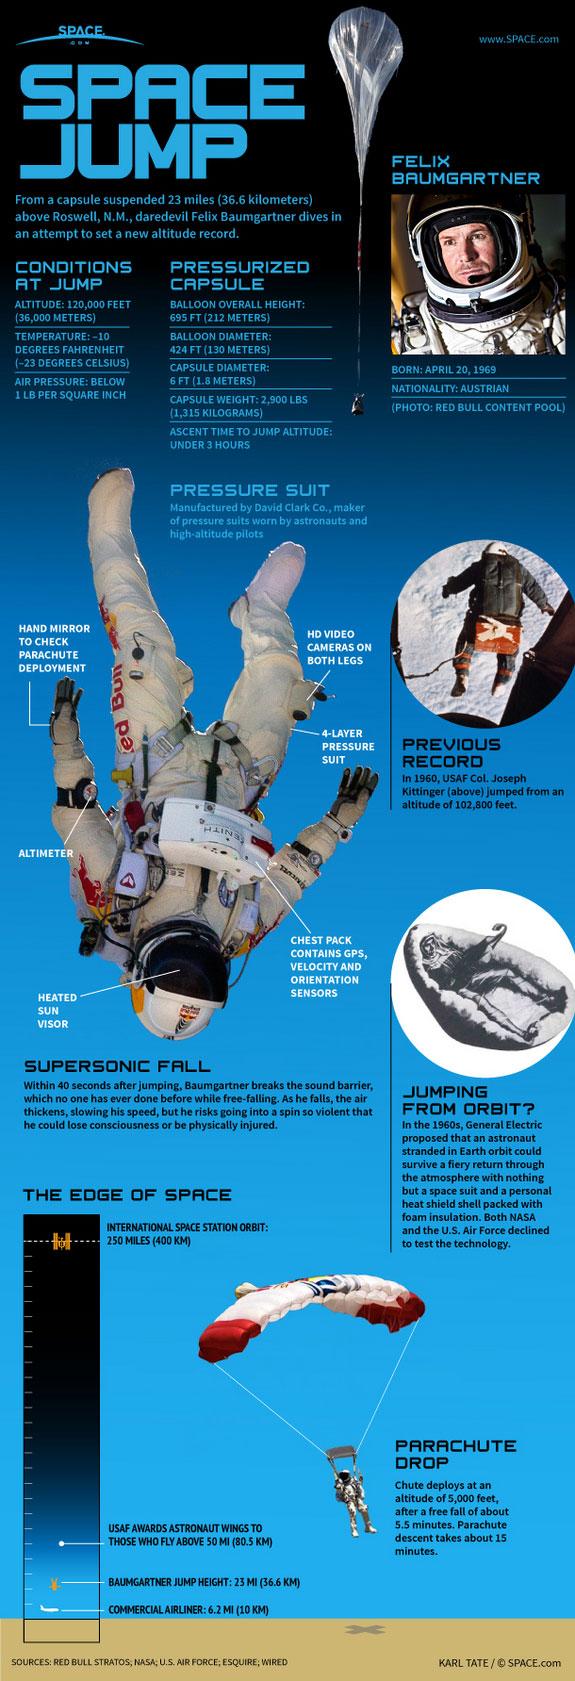 Red Bull Stratos Felix Baumgartner Space Jump Infographic